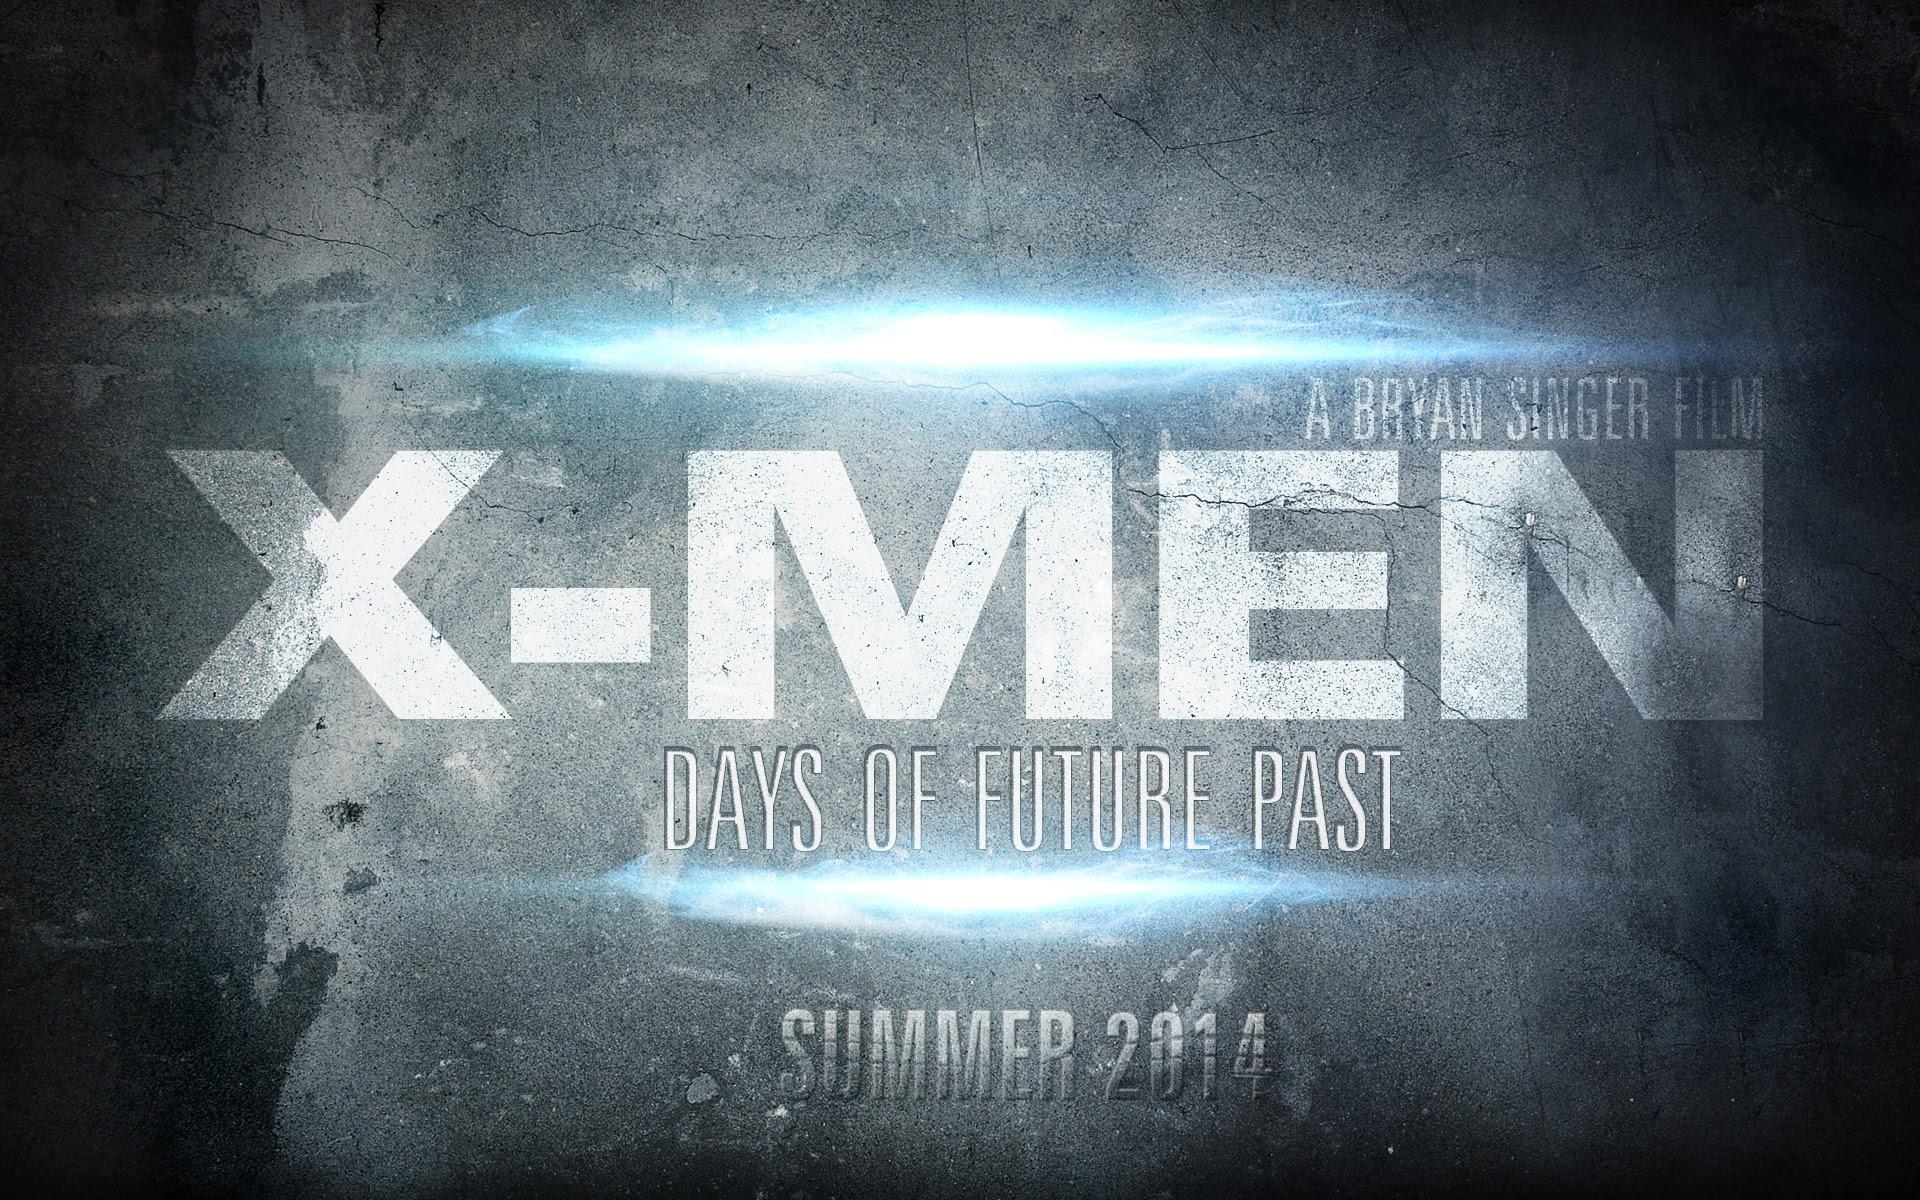 X Men 2014 Movie Days of Future Past 5v Wallpaper HD 1920x1200